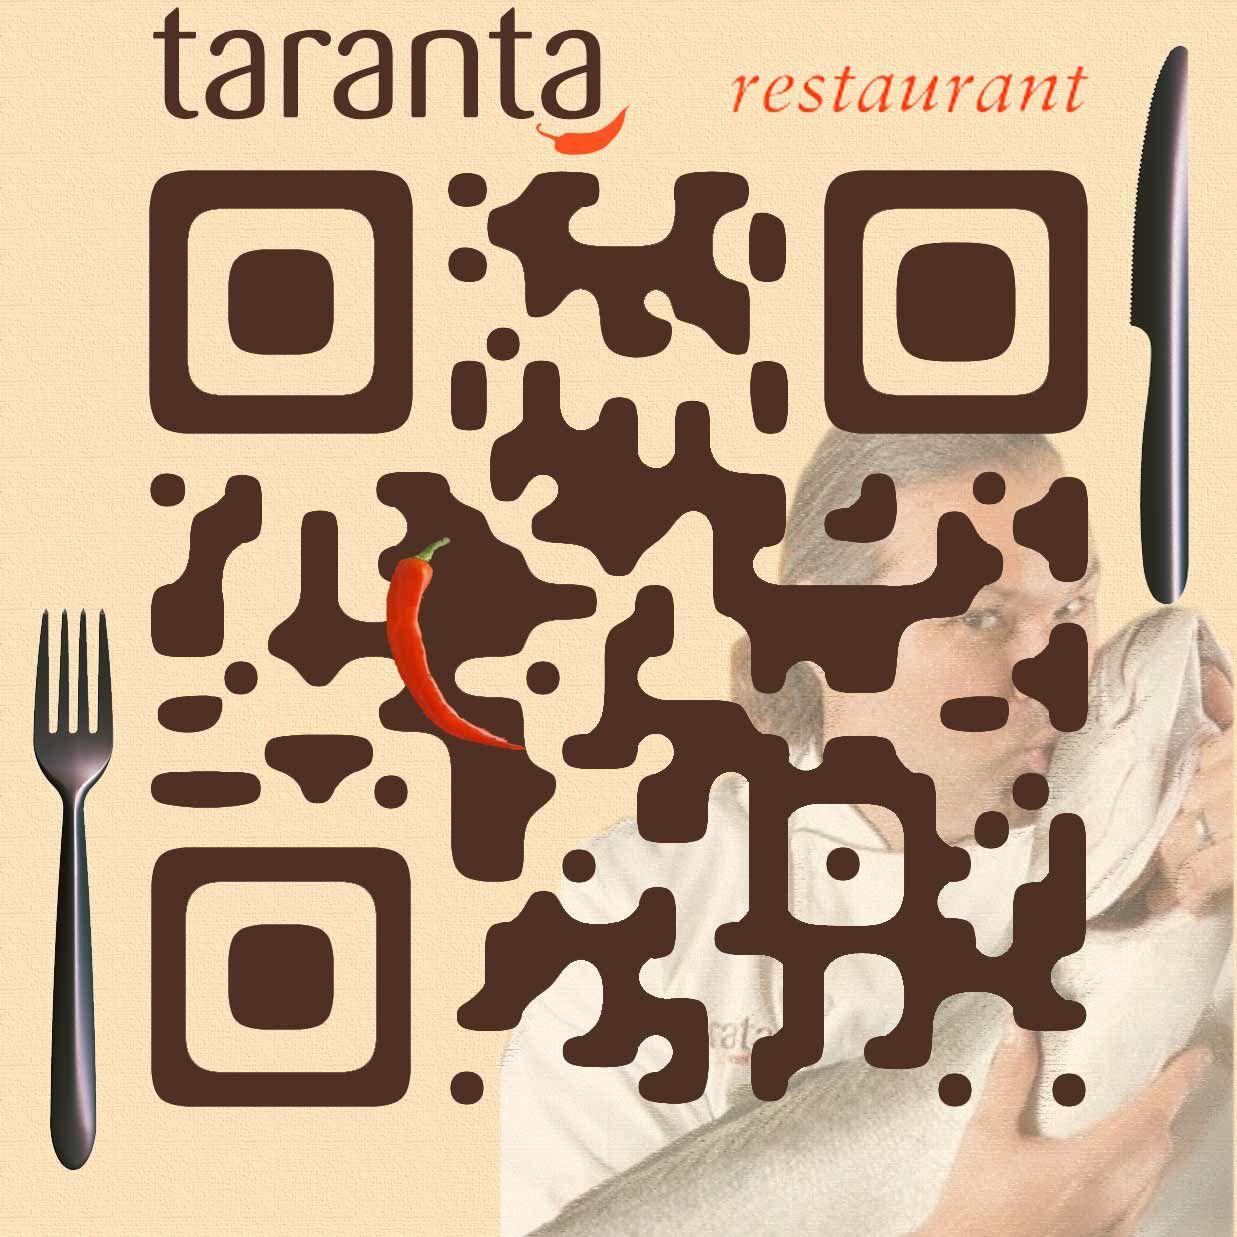 QR code for Taranta restaurant in Boston